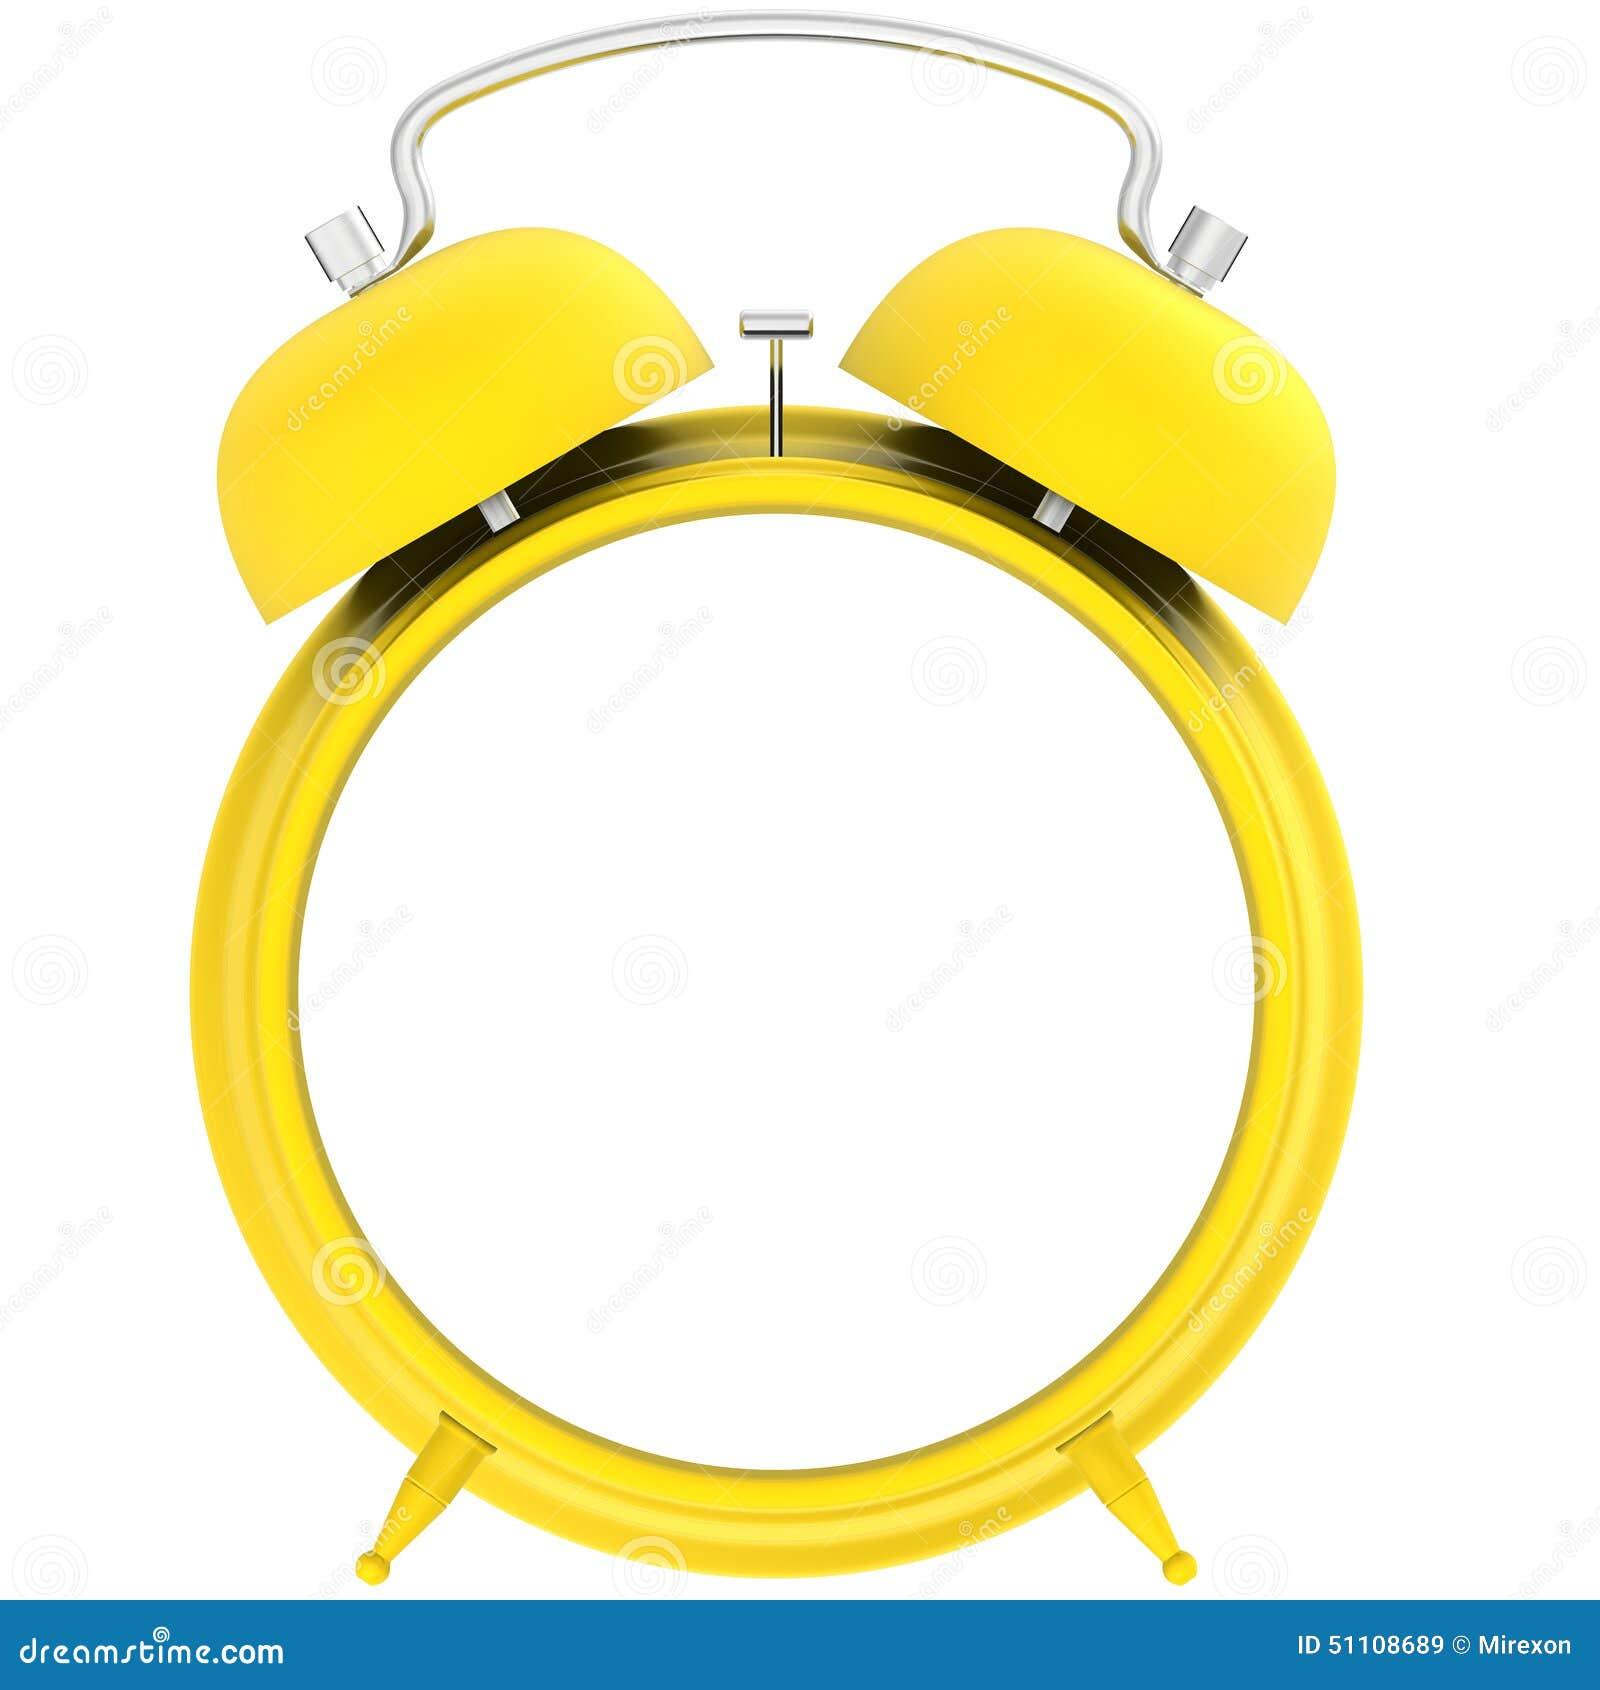 Yellow Blank Alarm Clock Stock Illustration - Image: 51108689 Blank Alarm Clock Clipart